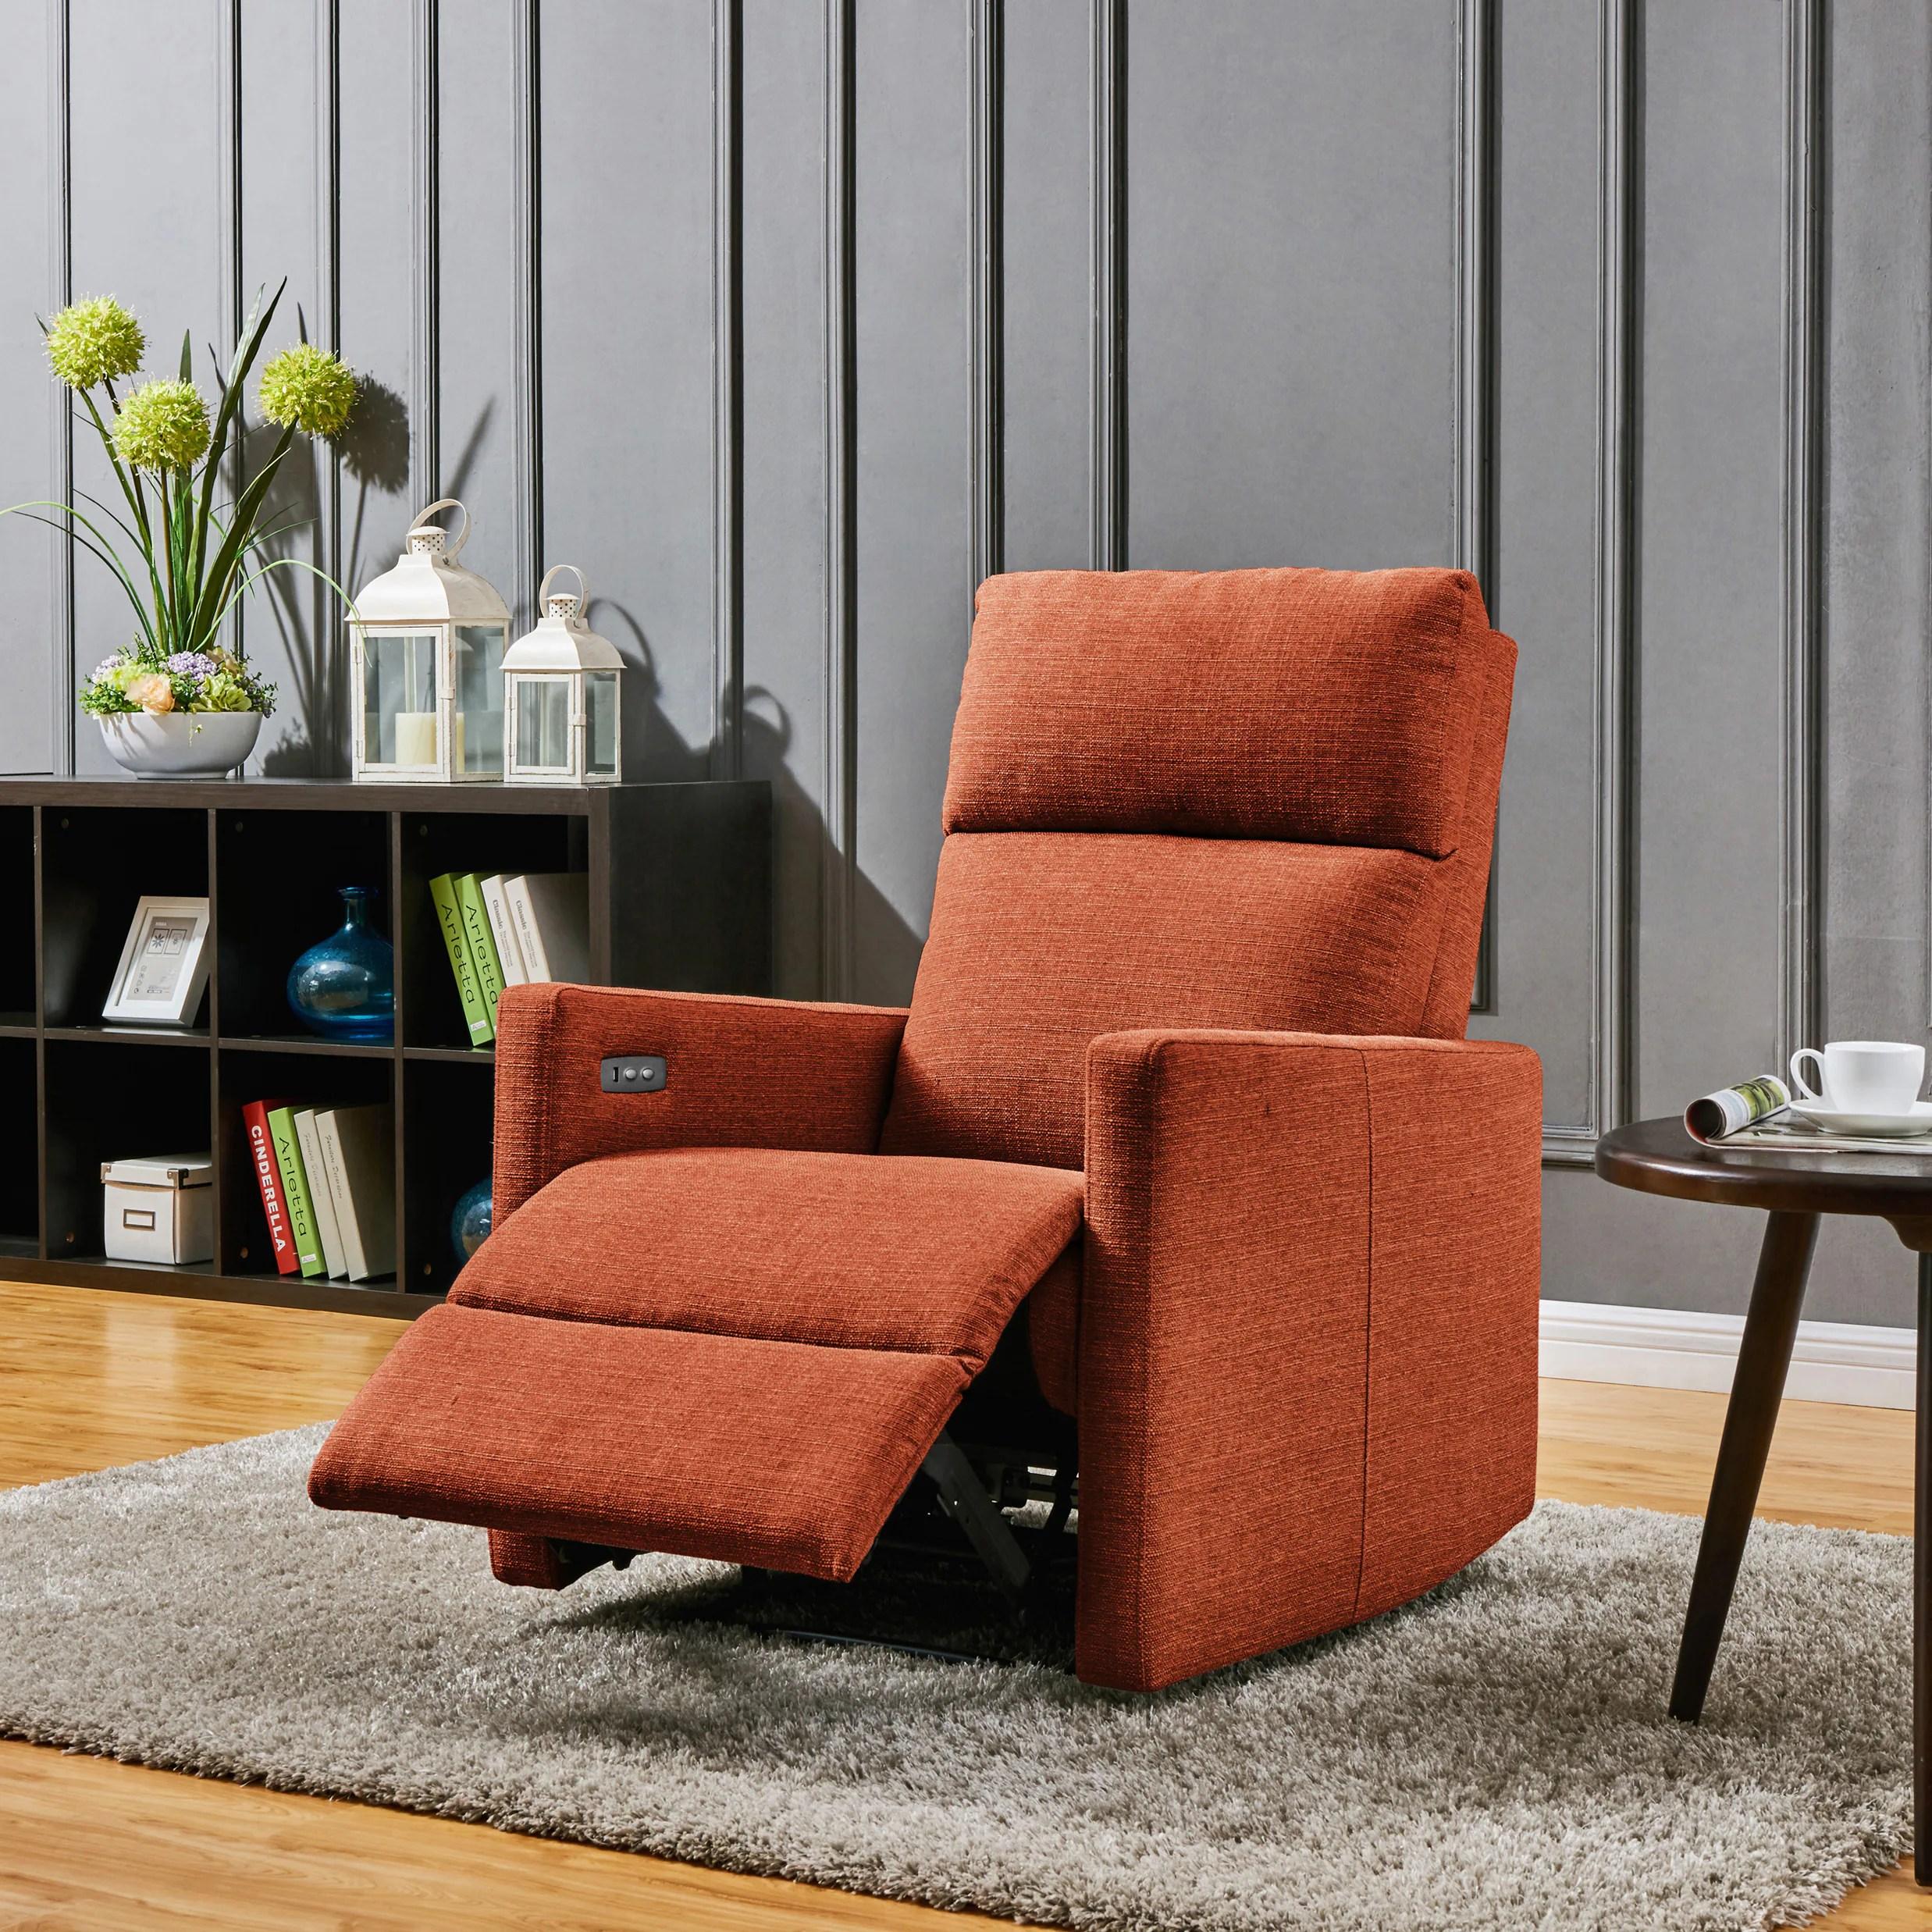 wall hugger recliner chair swivel uk ebay shop prolounger orange power with usb port